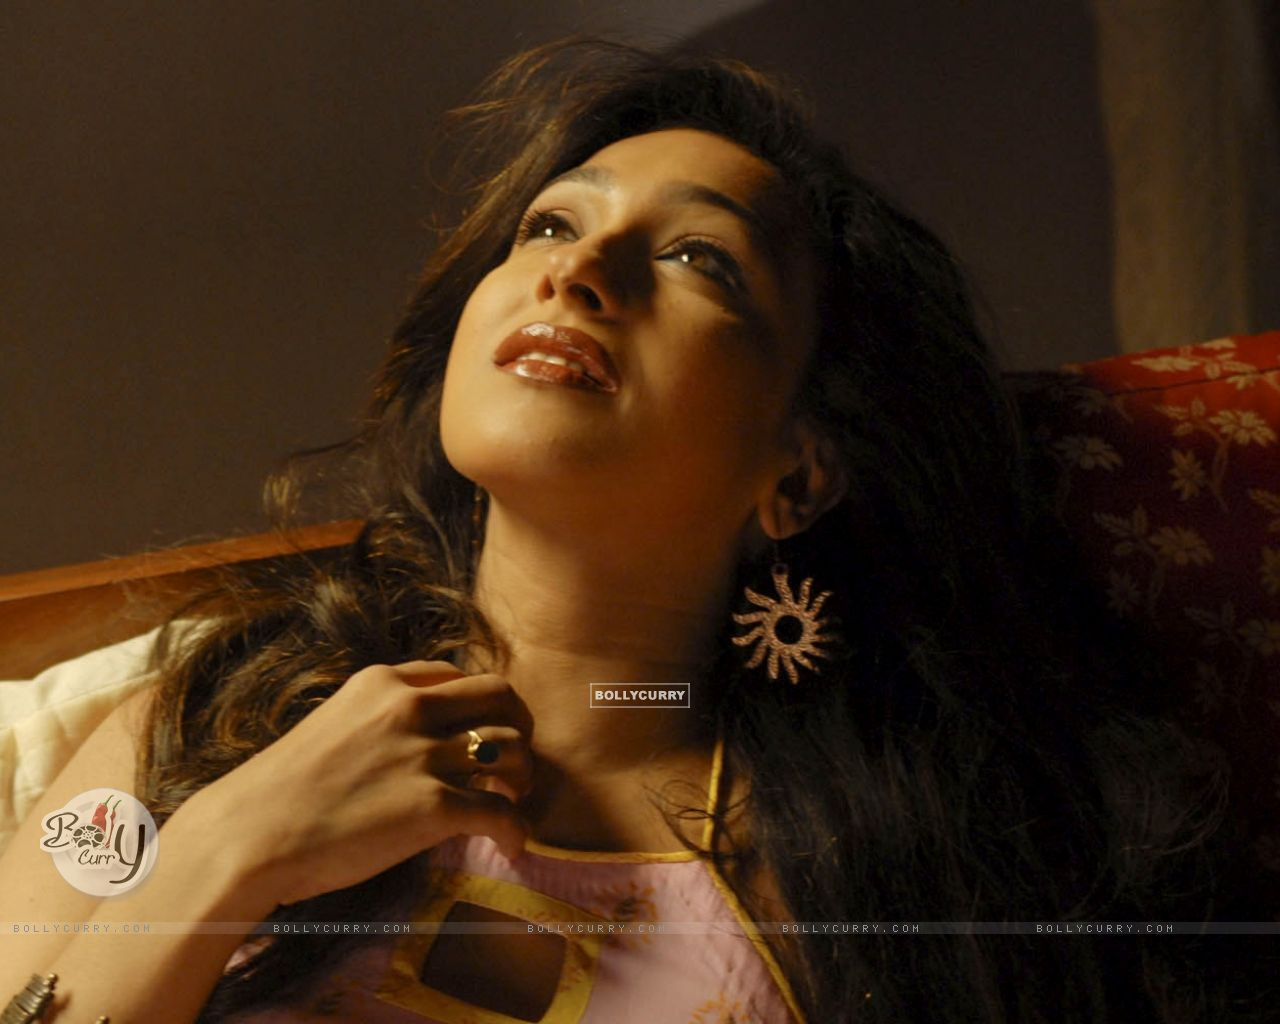 Bengali movie hot scene mehuly sarkar biren - 5 4